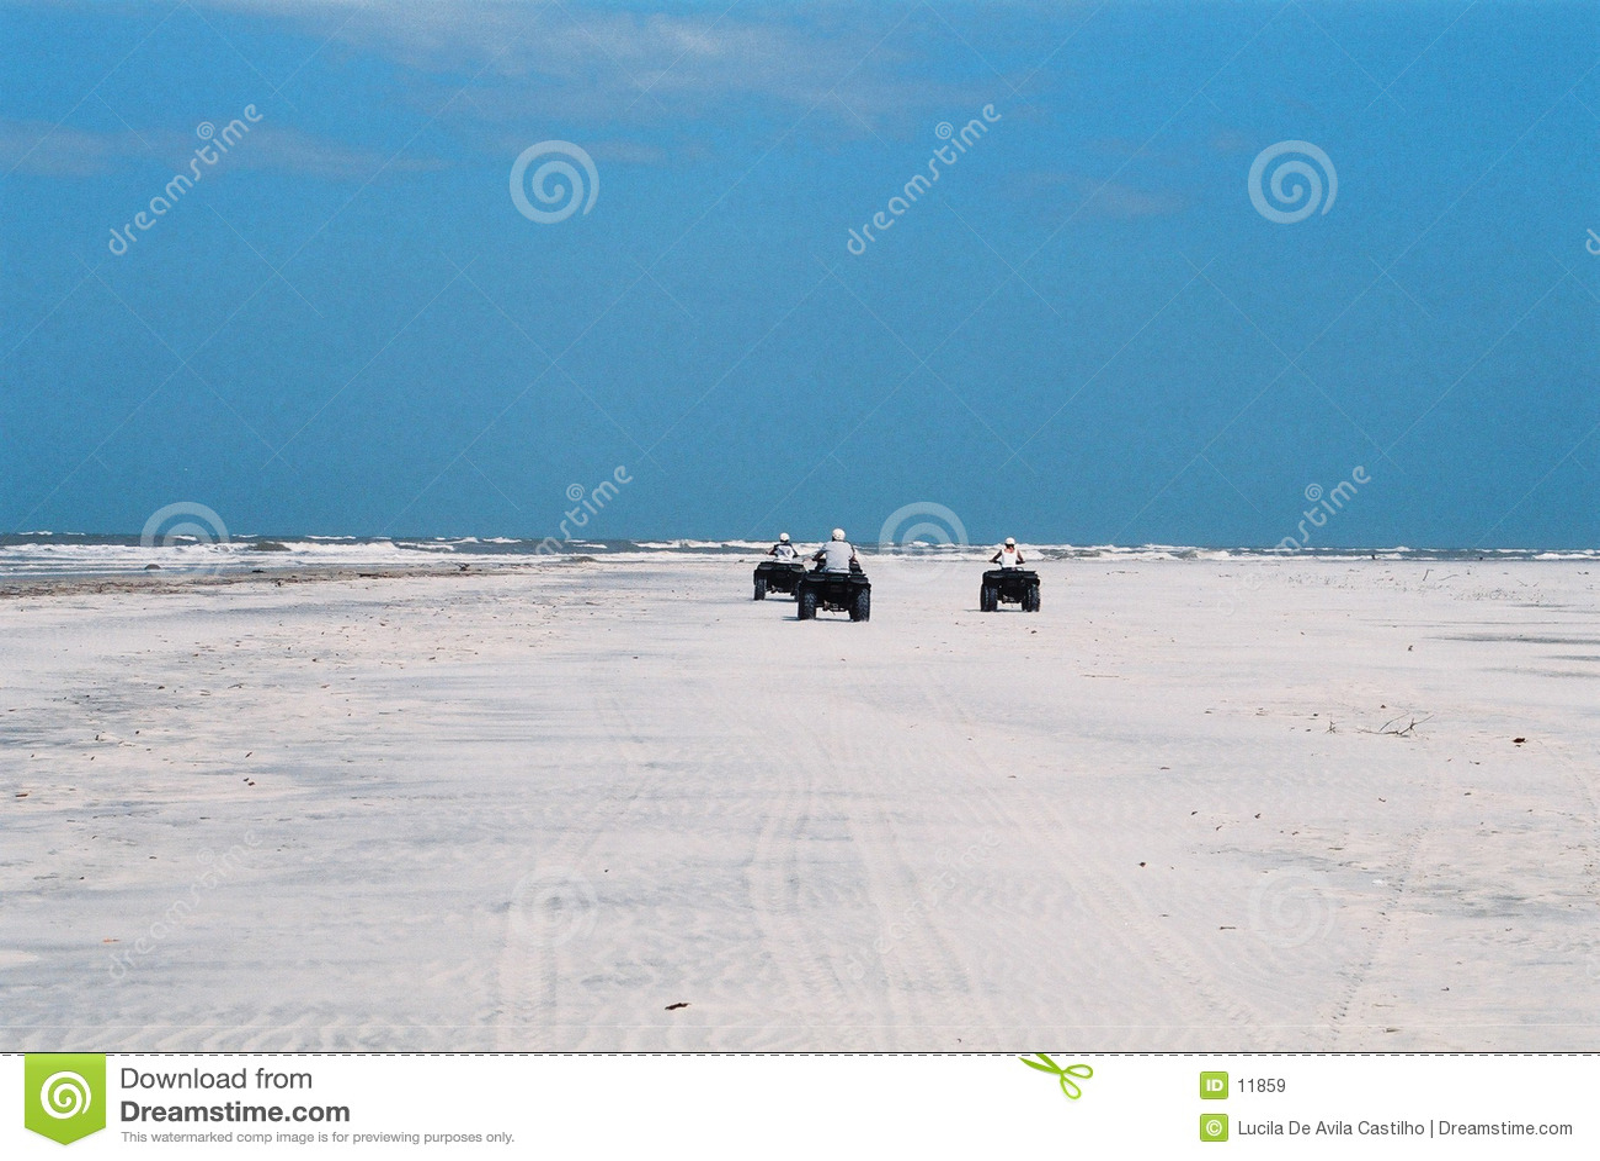 Aventura en la playa abandonada